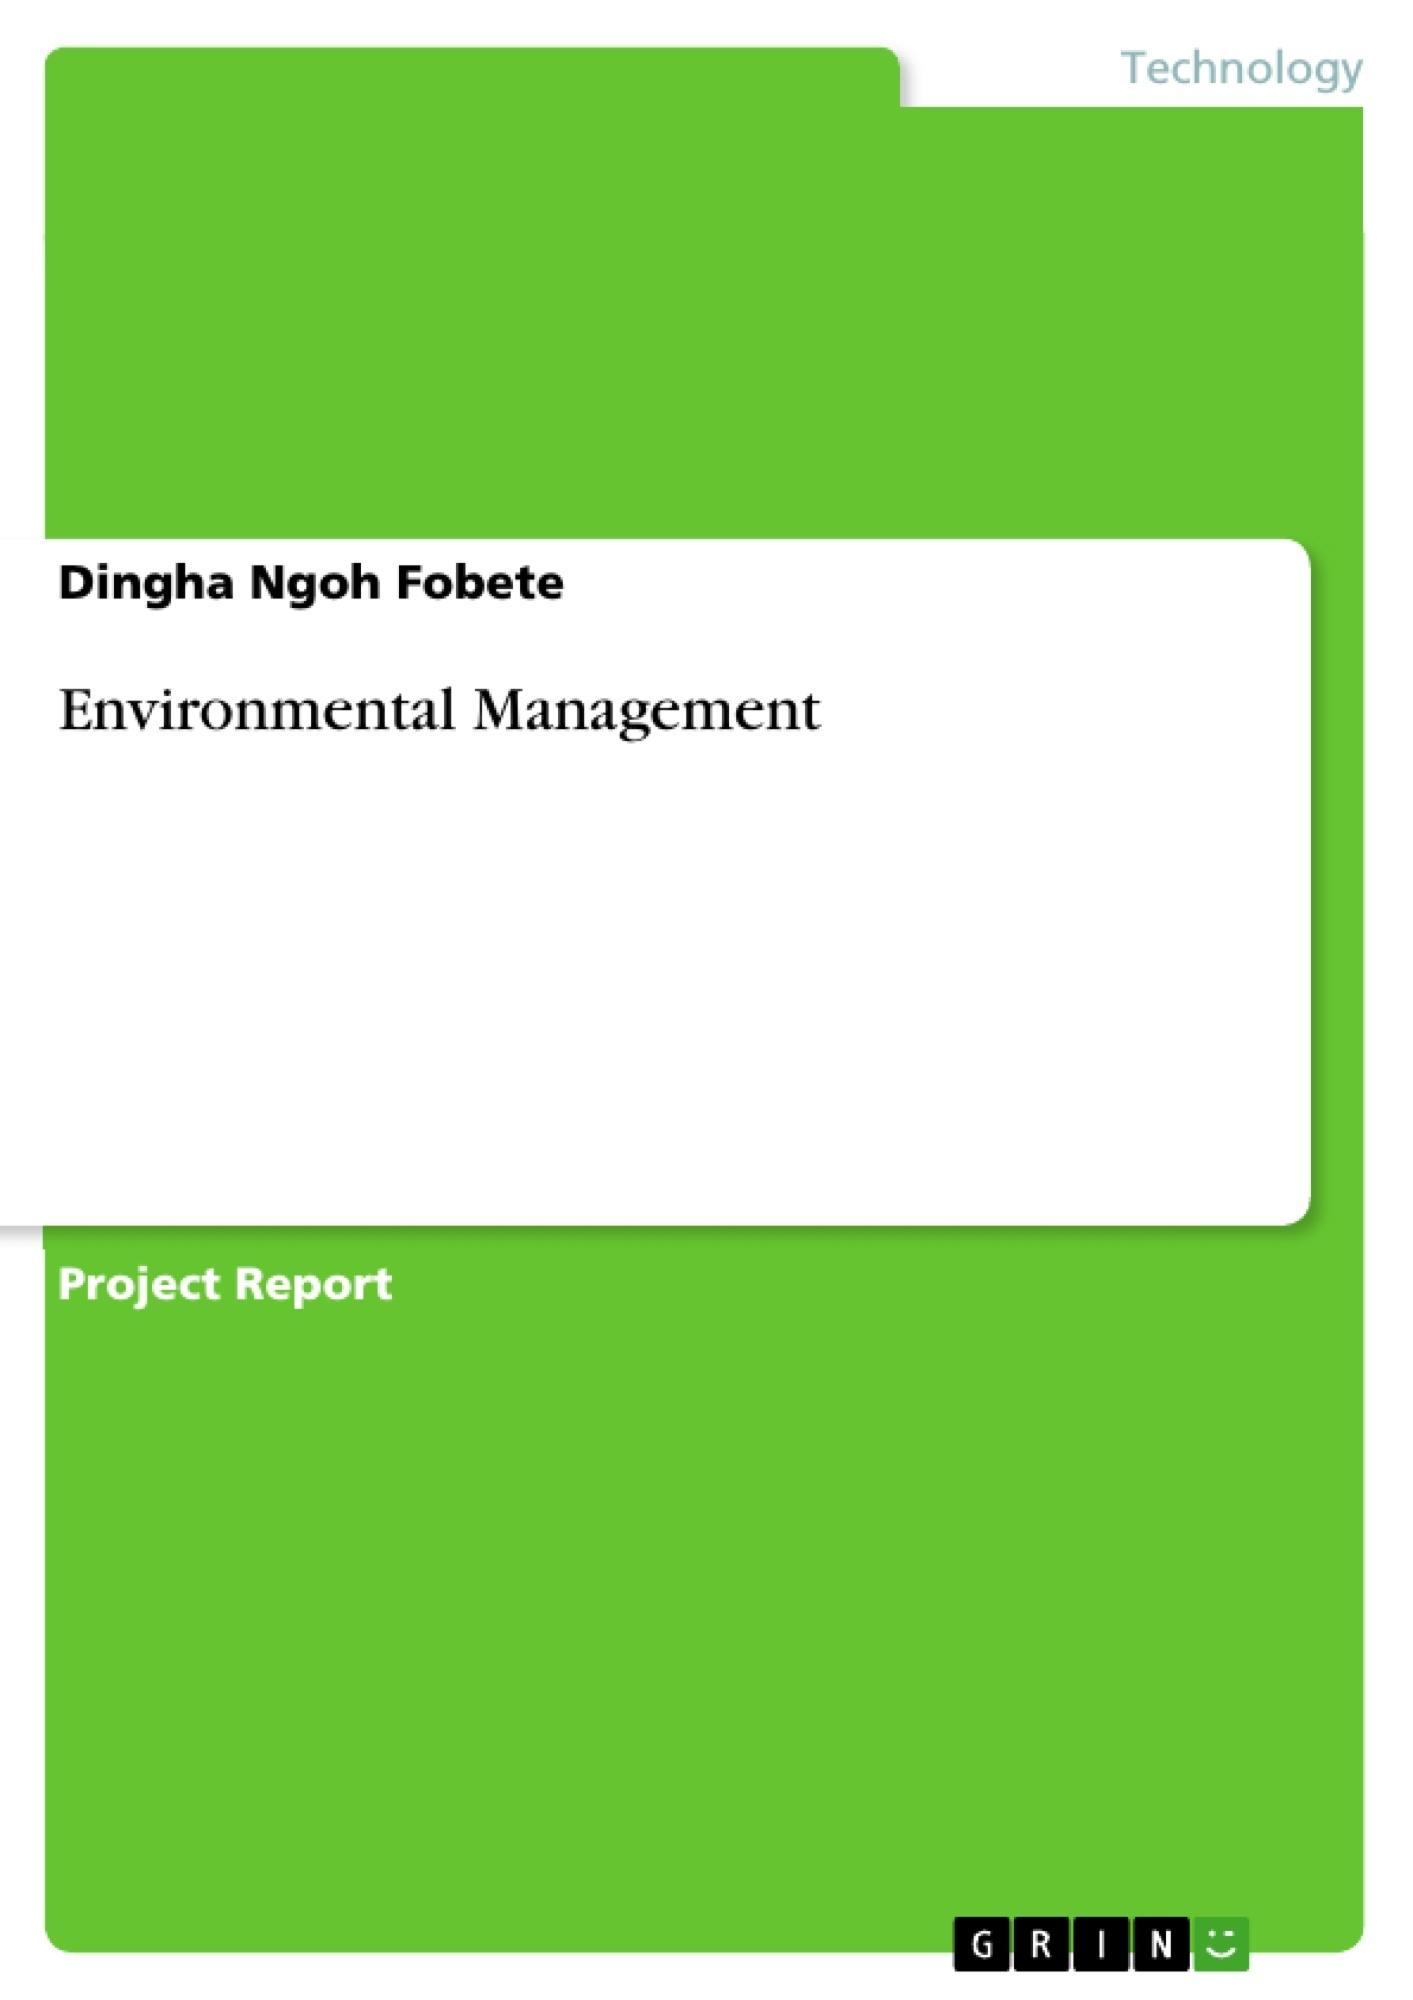 Title: Environmental Management